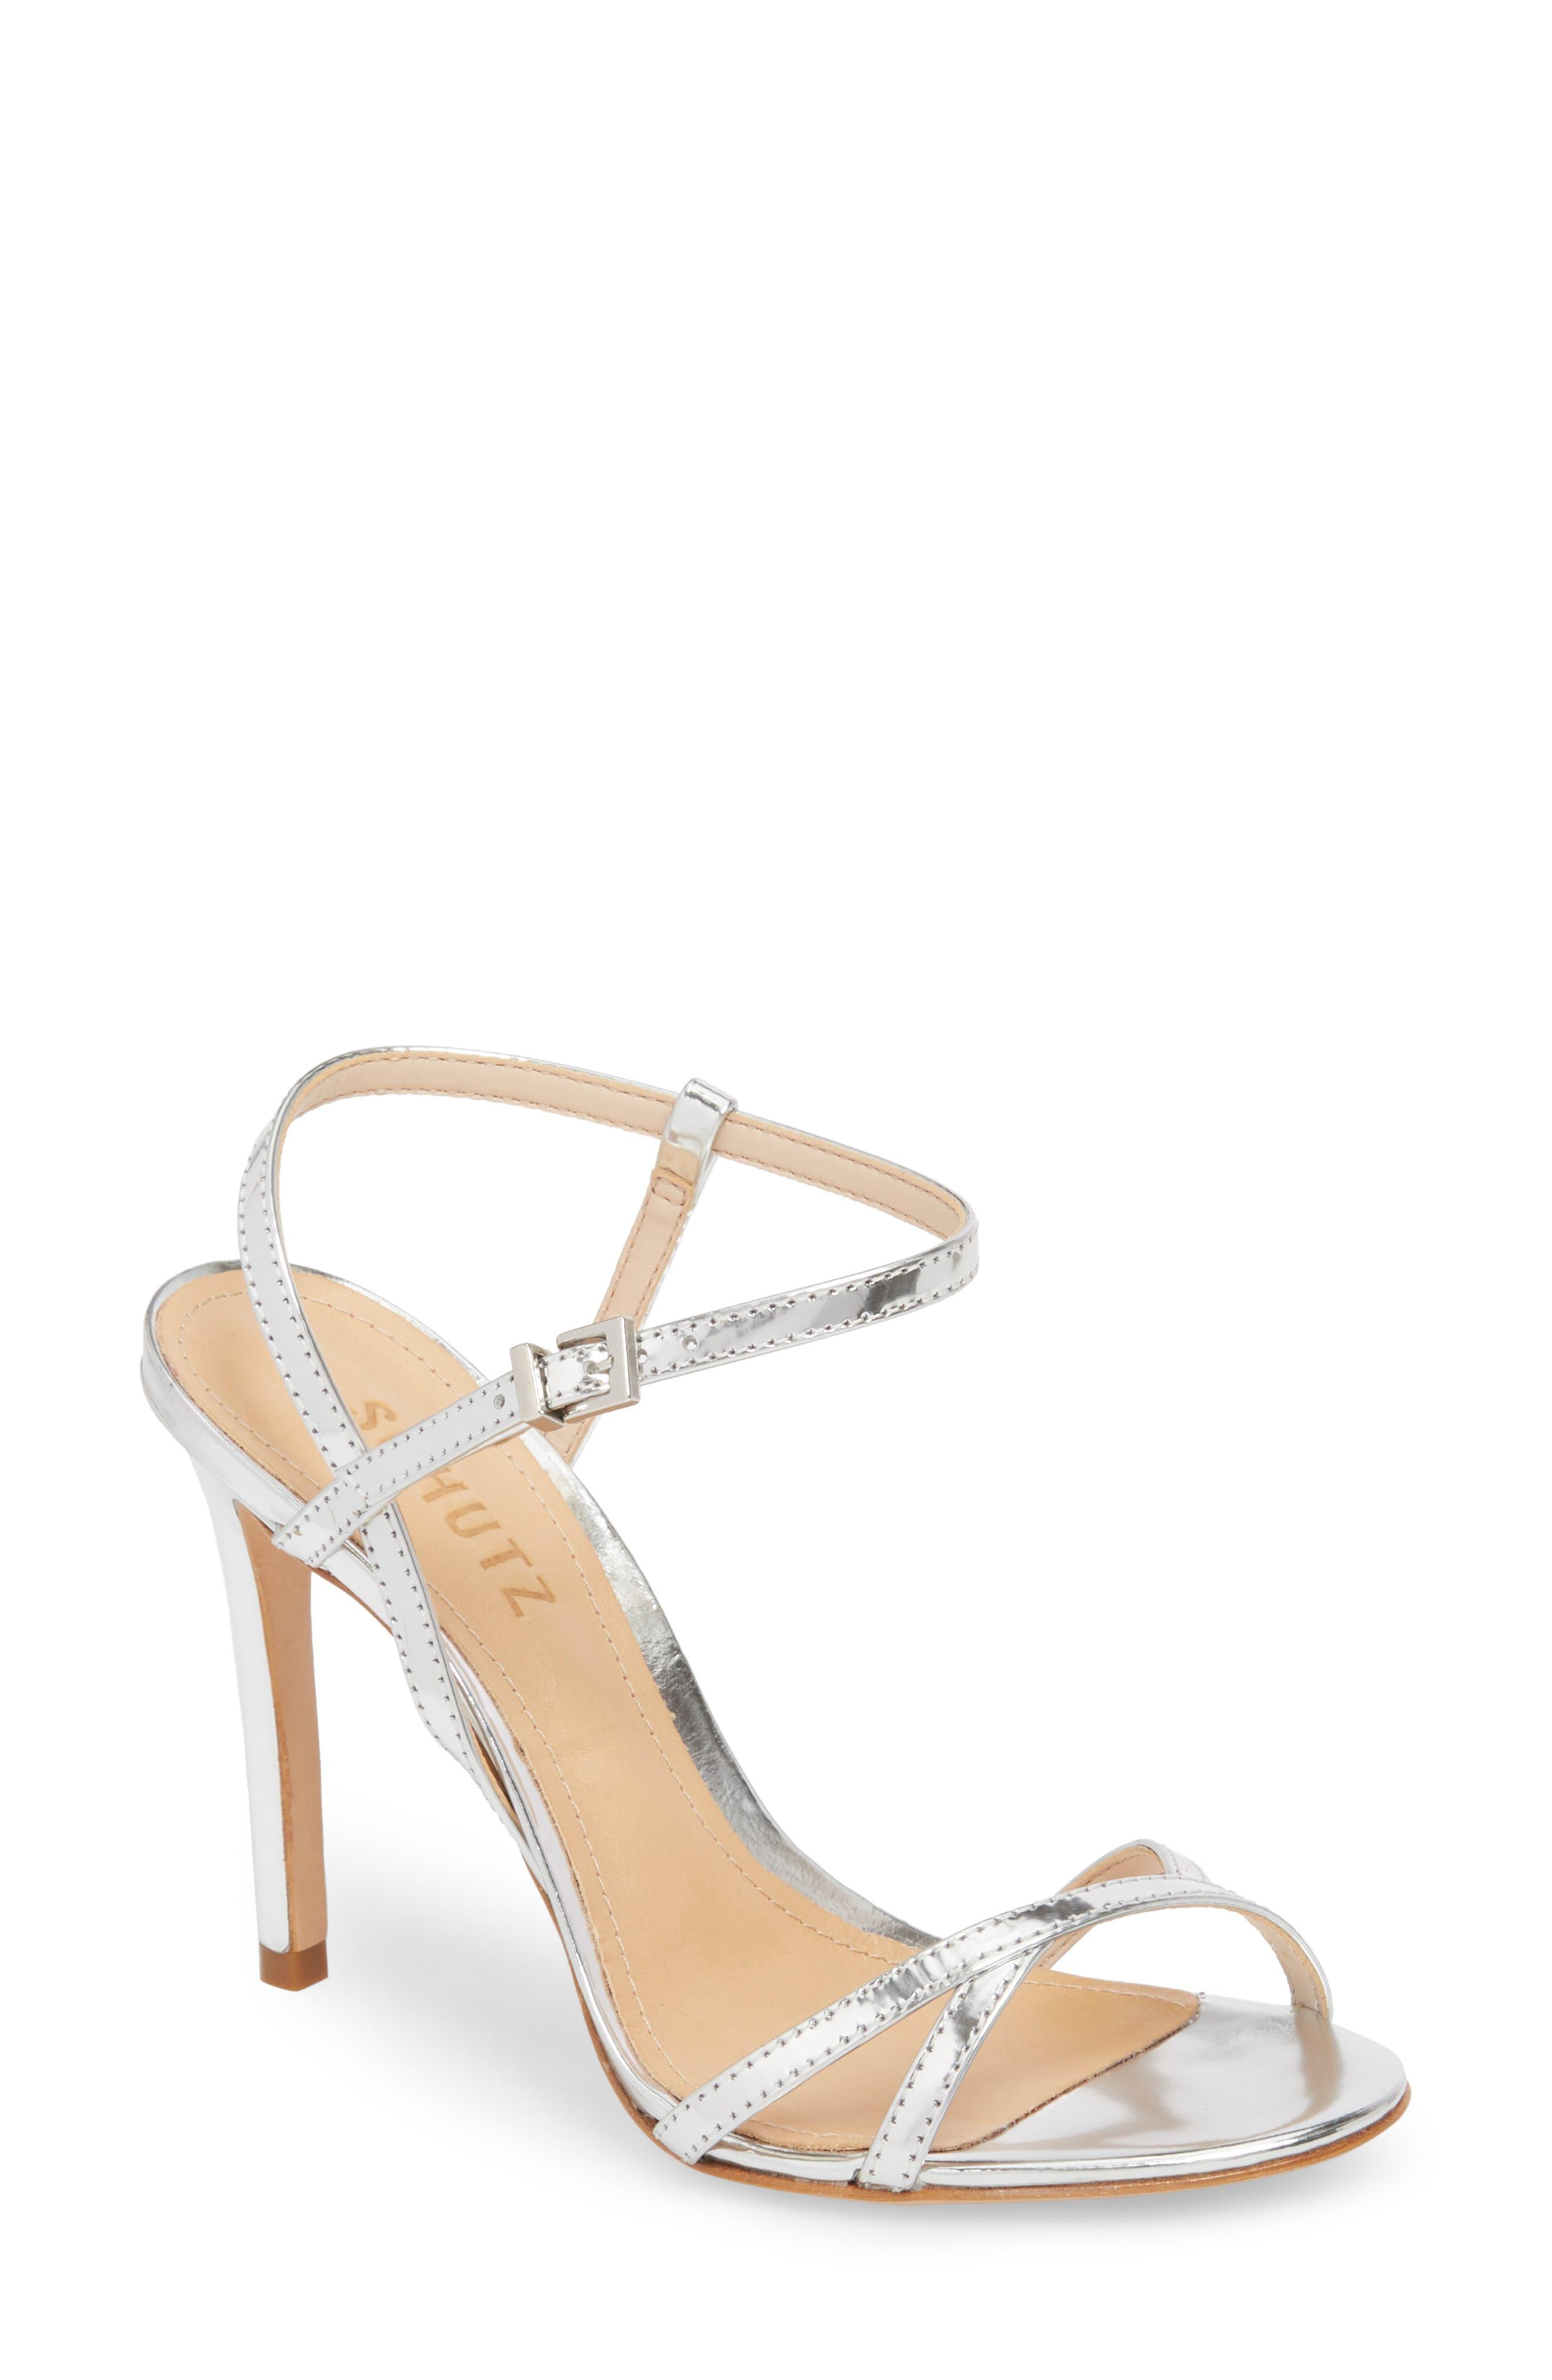 Opal Sandal,                         Main,                         color, PRATA LEATHER